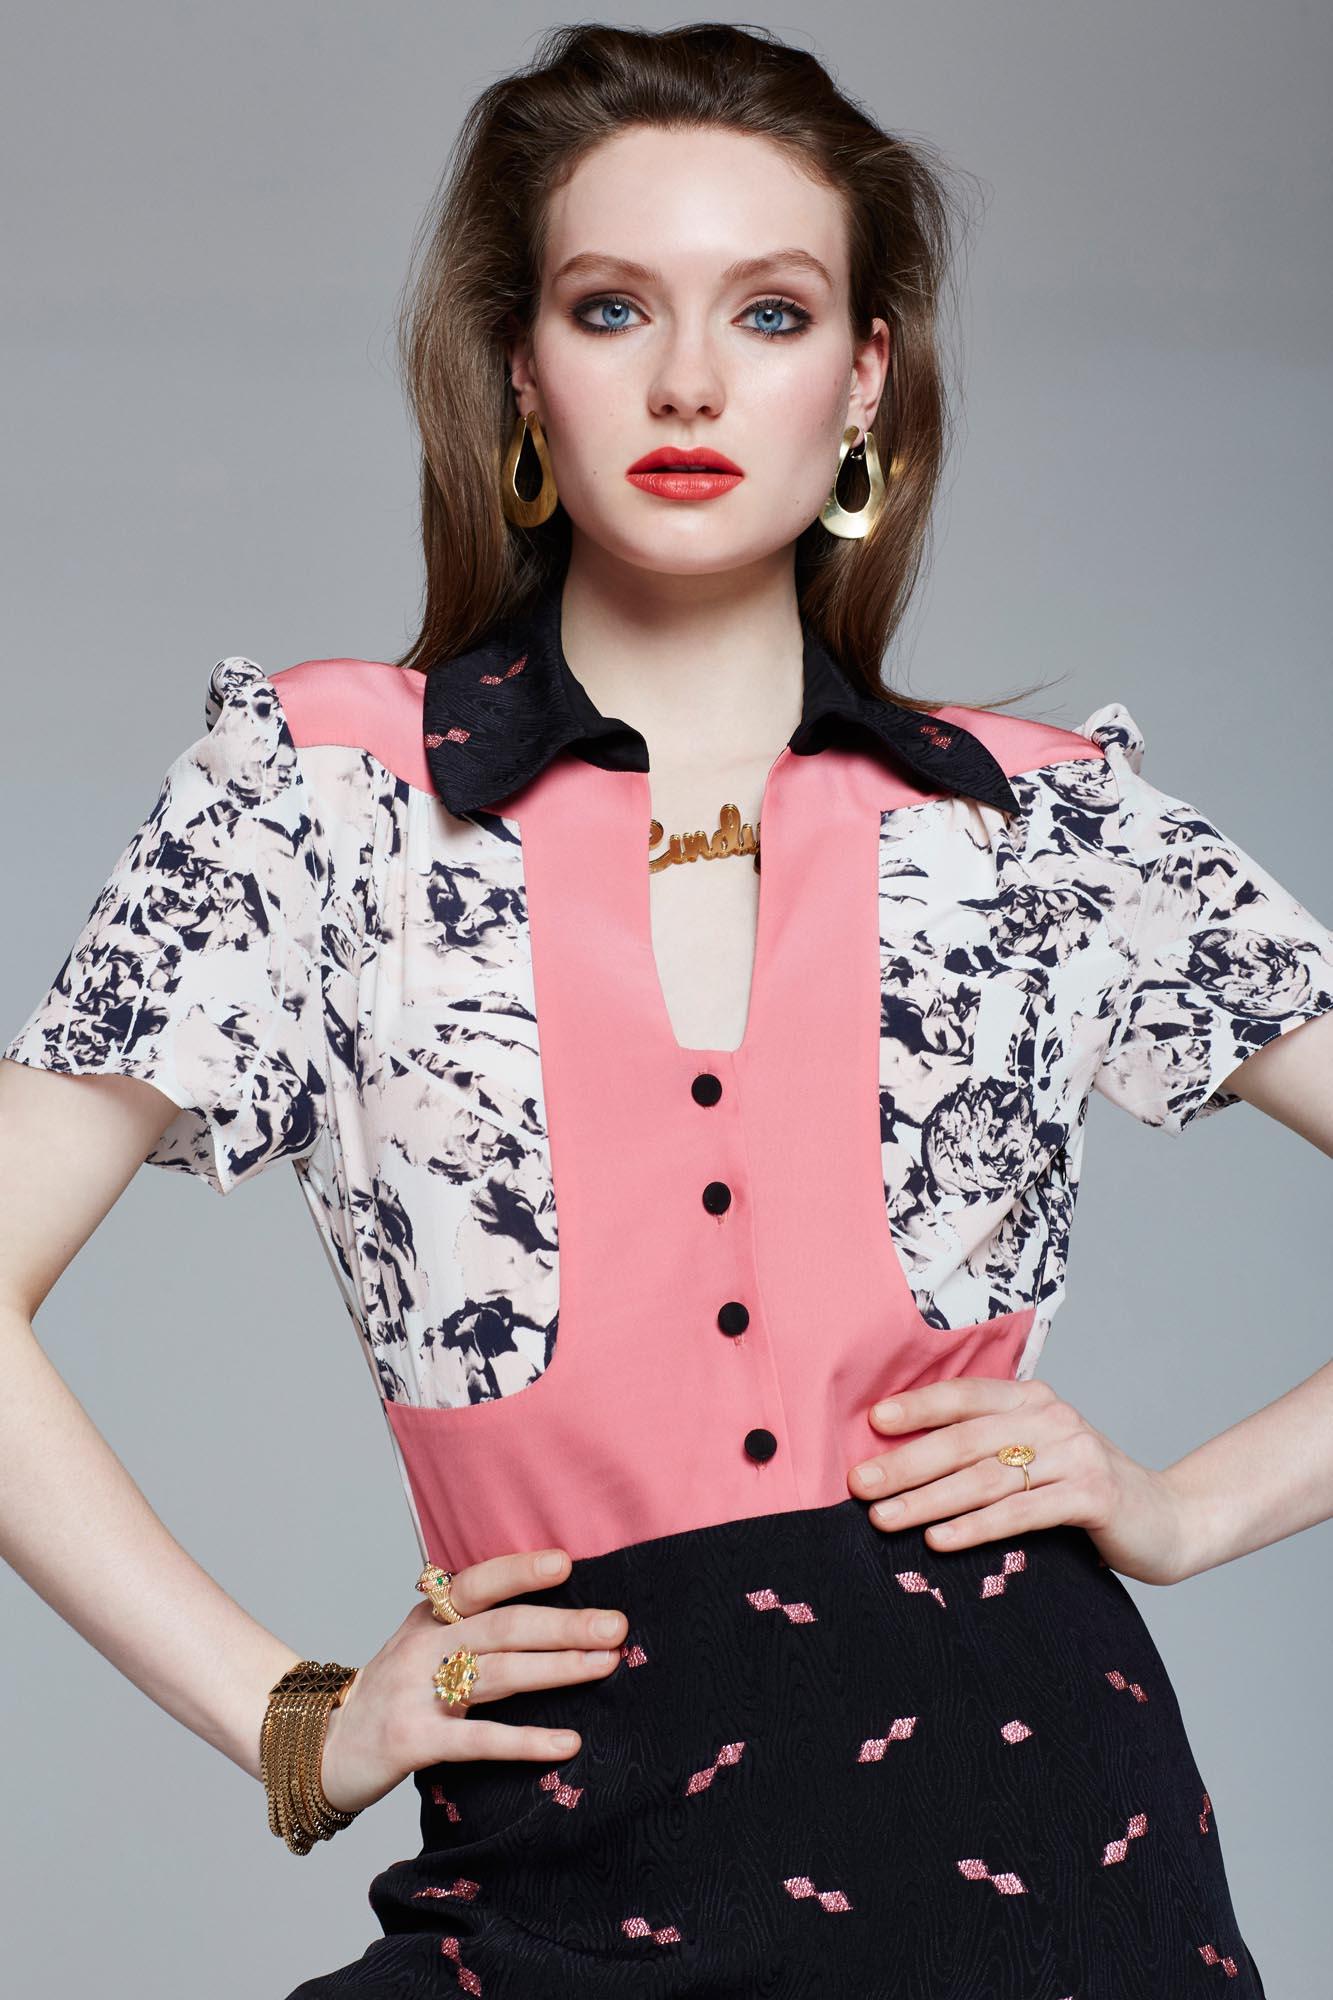 British fashion designer